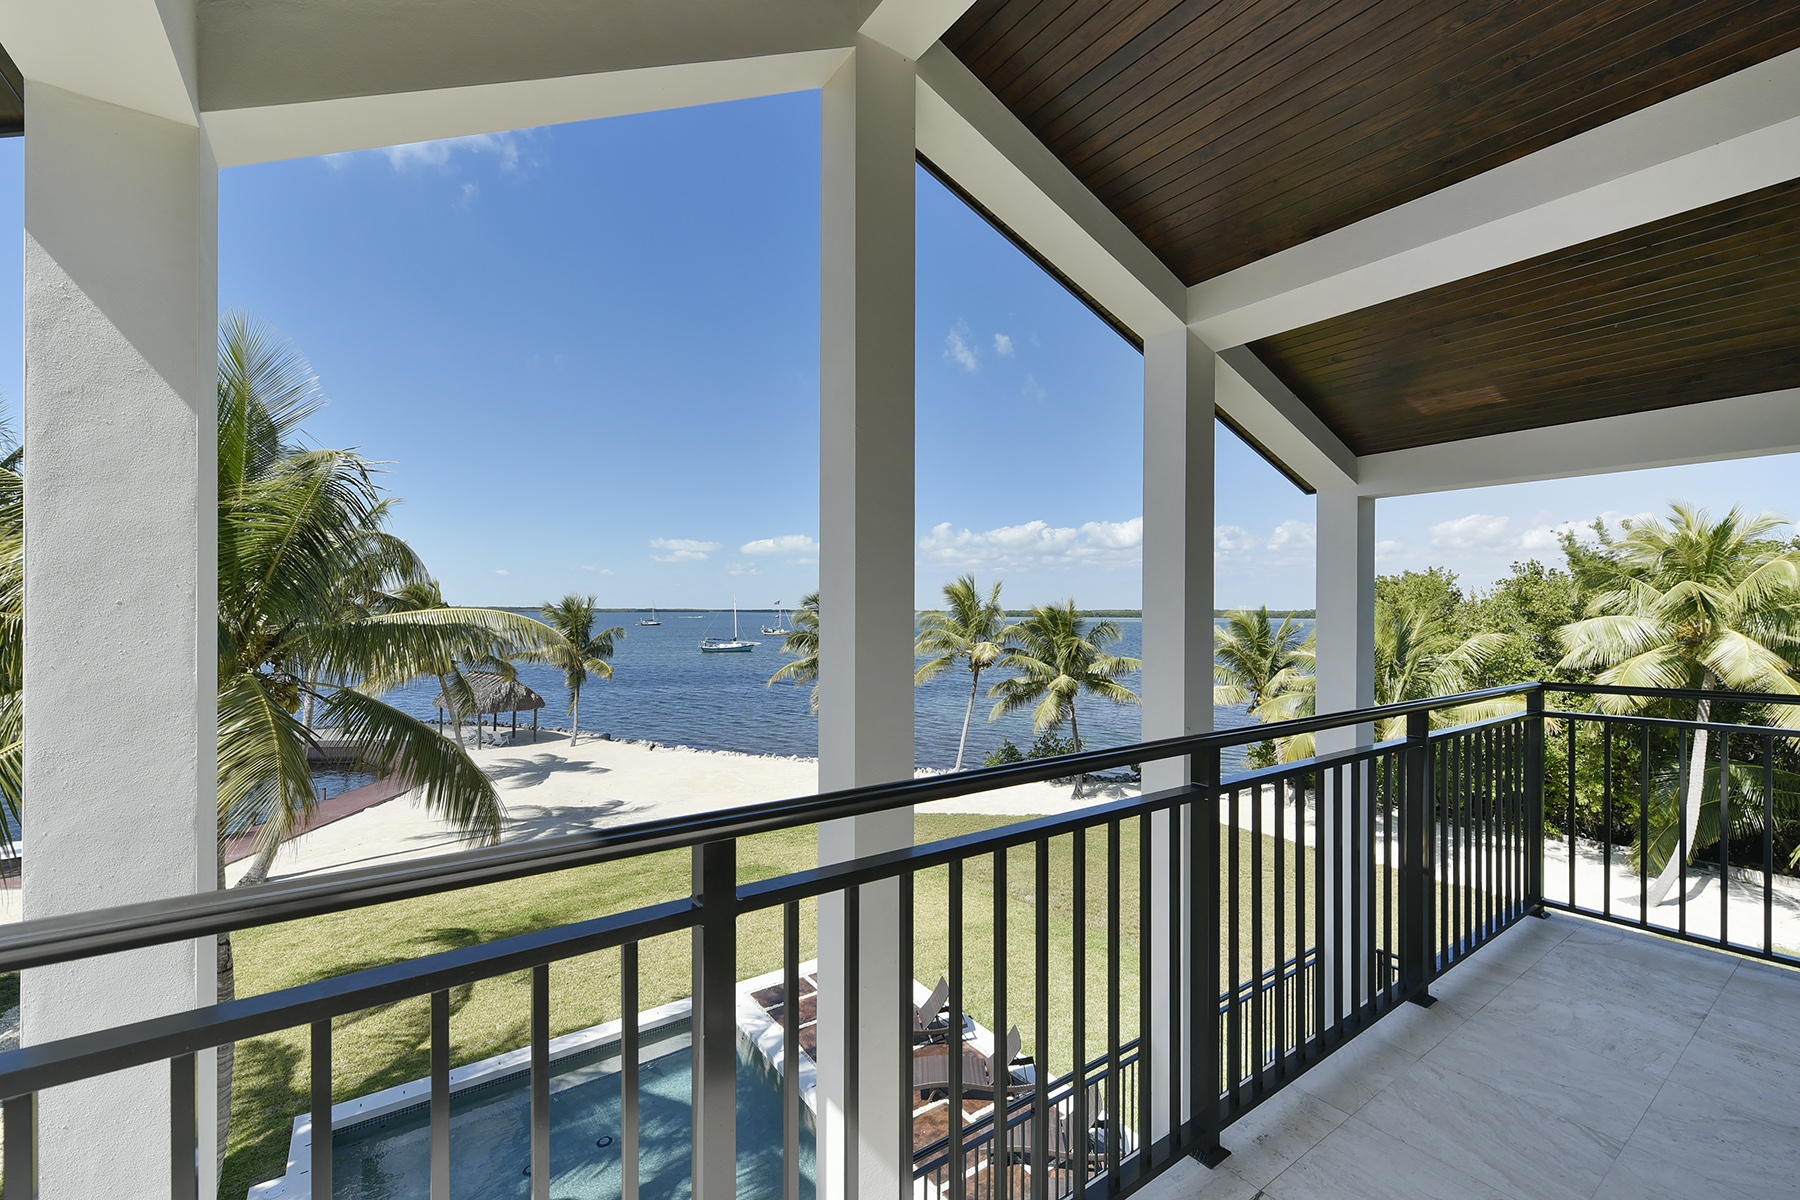 Additional photo for property listing at Exclusive Mahogany Bay - Florida Keys 101956 Overseas Highway Key Largo, Florida 33037 Stati Uniti